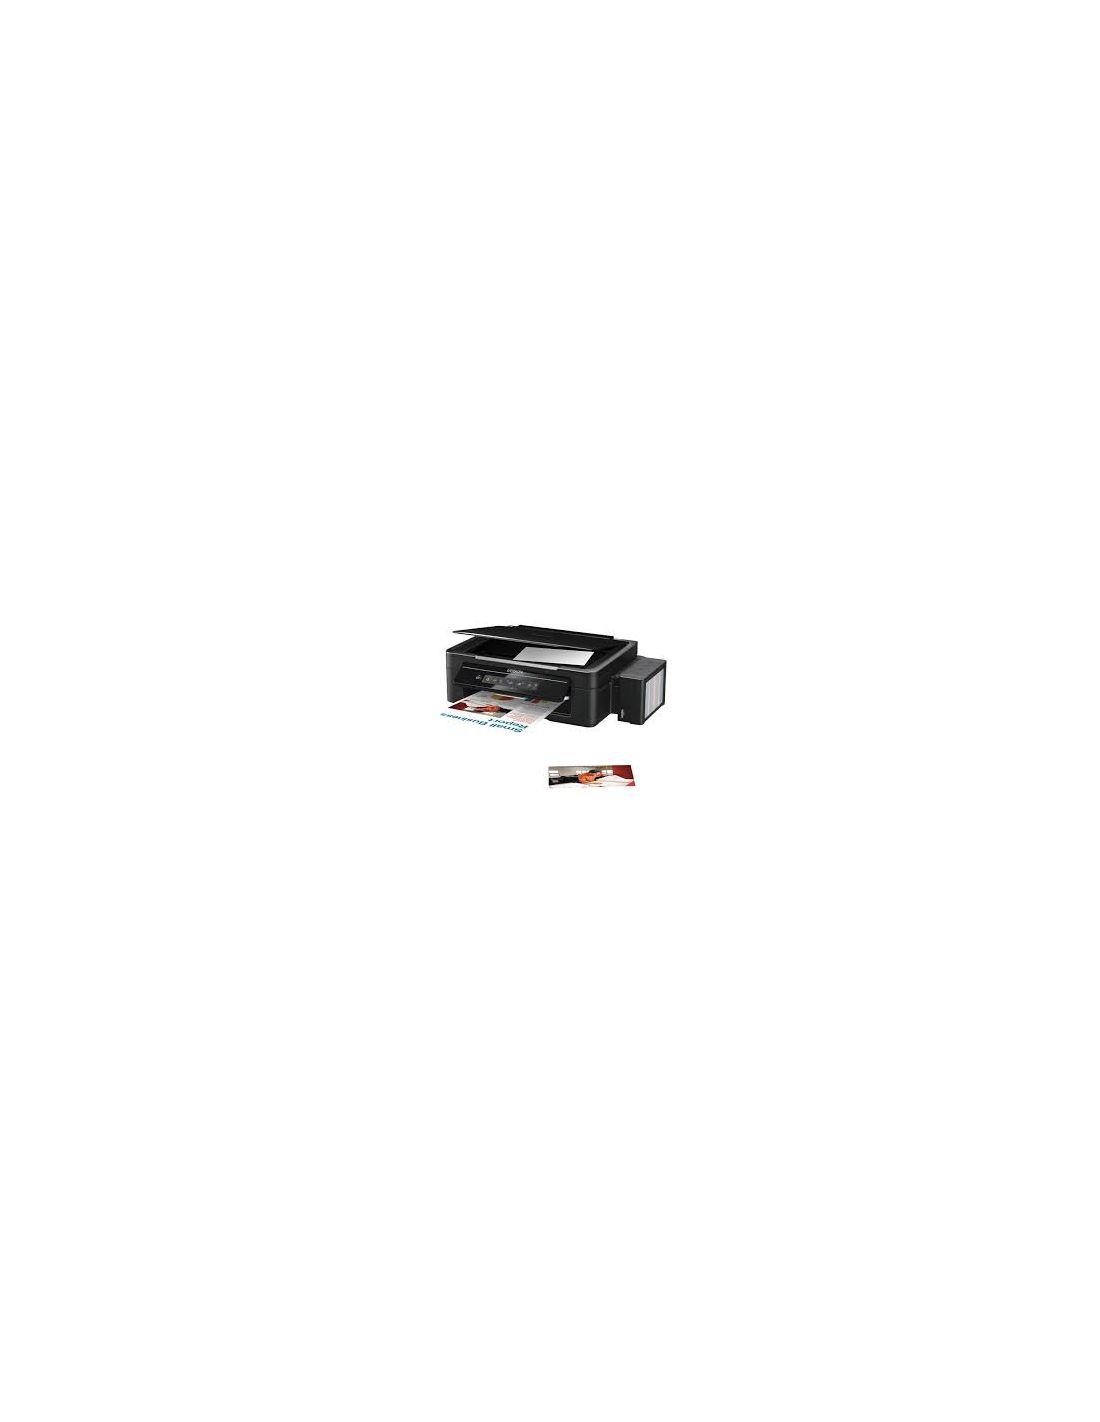 Epson Ecotank L355 Impresora De Inyecci 243 N De Tinta